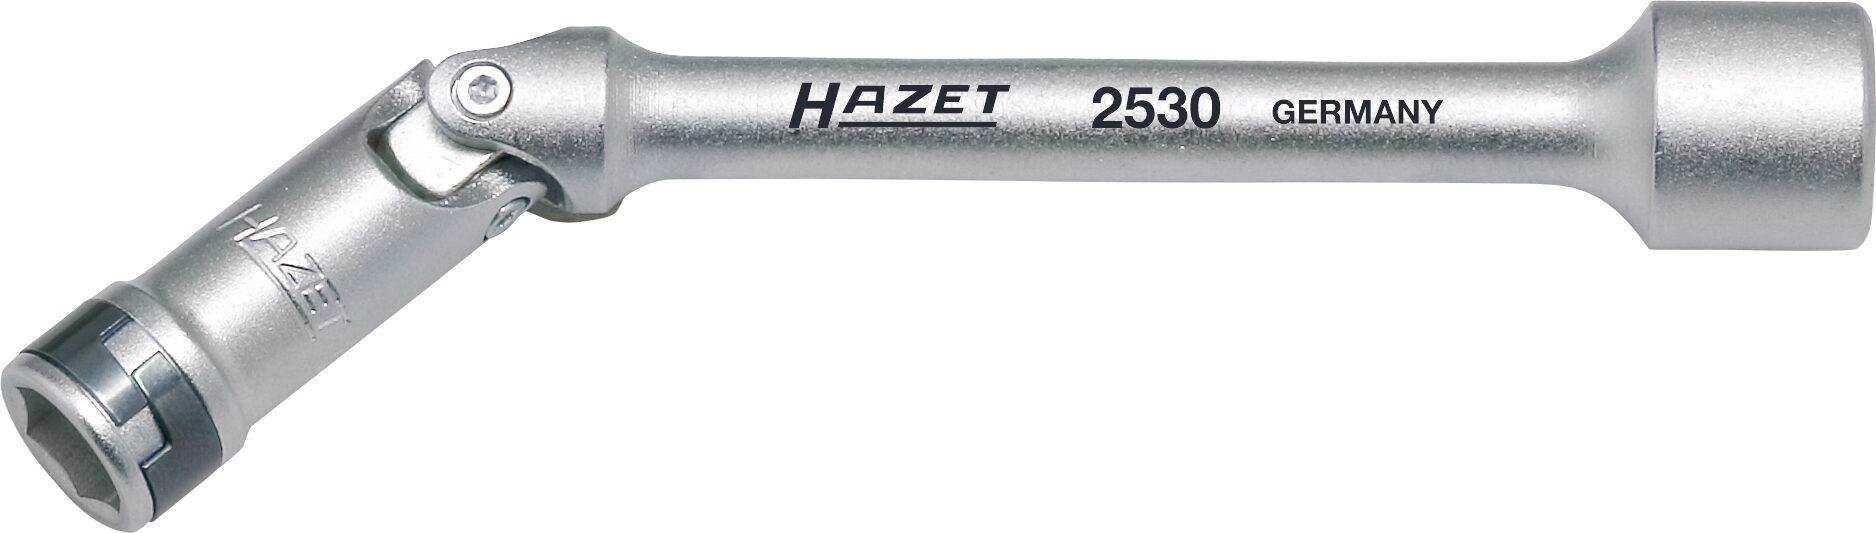 HAZET Glühkerzen Steckschlüssel 2530 ∙ Vierkant hohl 10 mm (3/8 Zoll) ∙ Außen-Sechskant-Tractionsprofil ∙ 10 mm